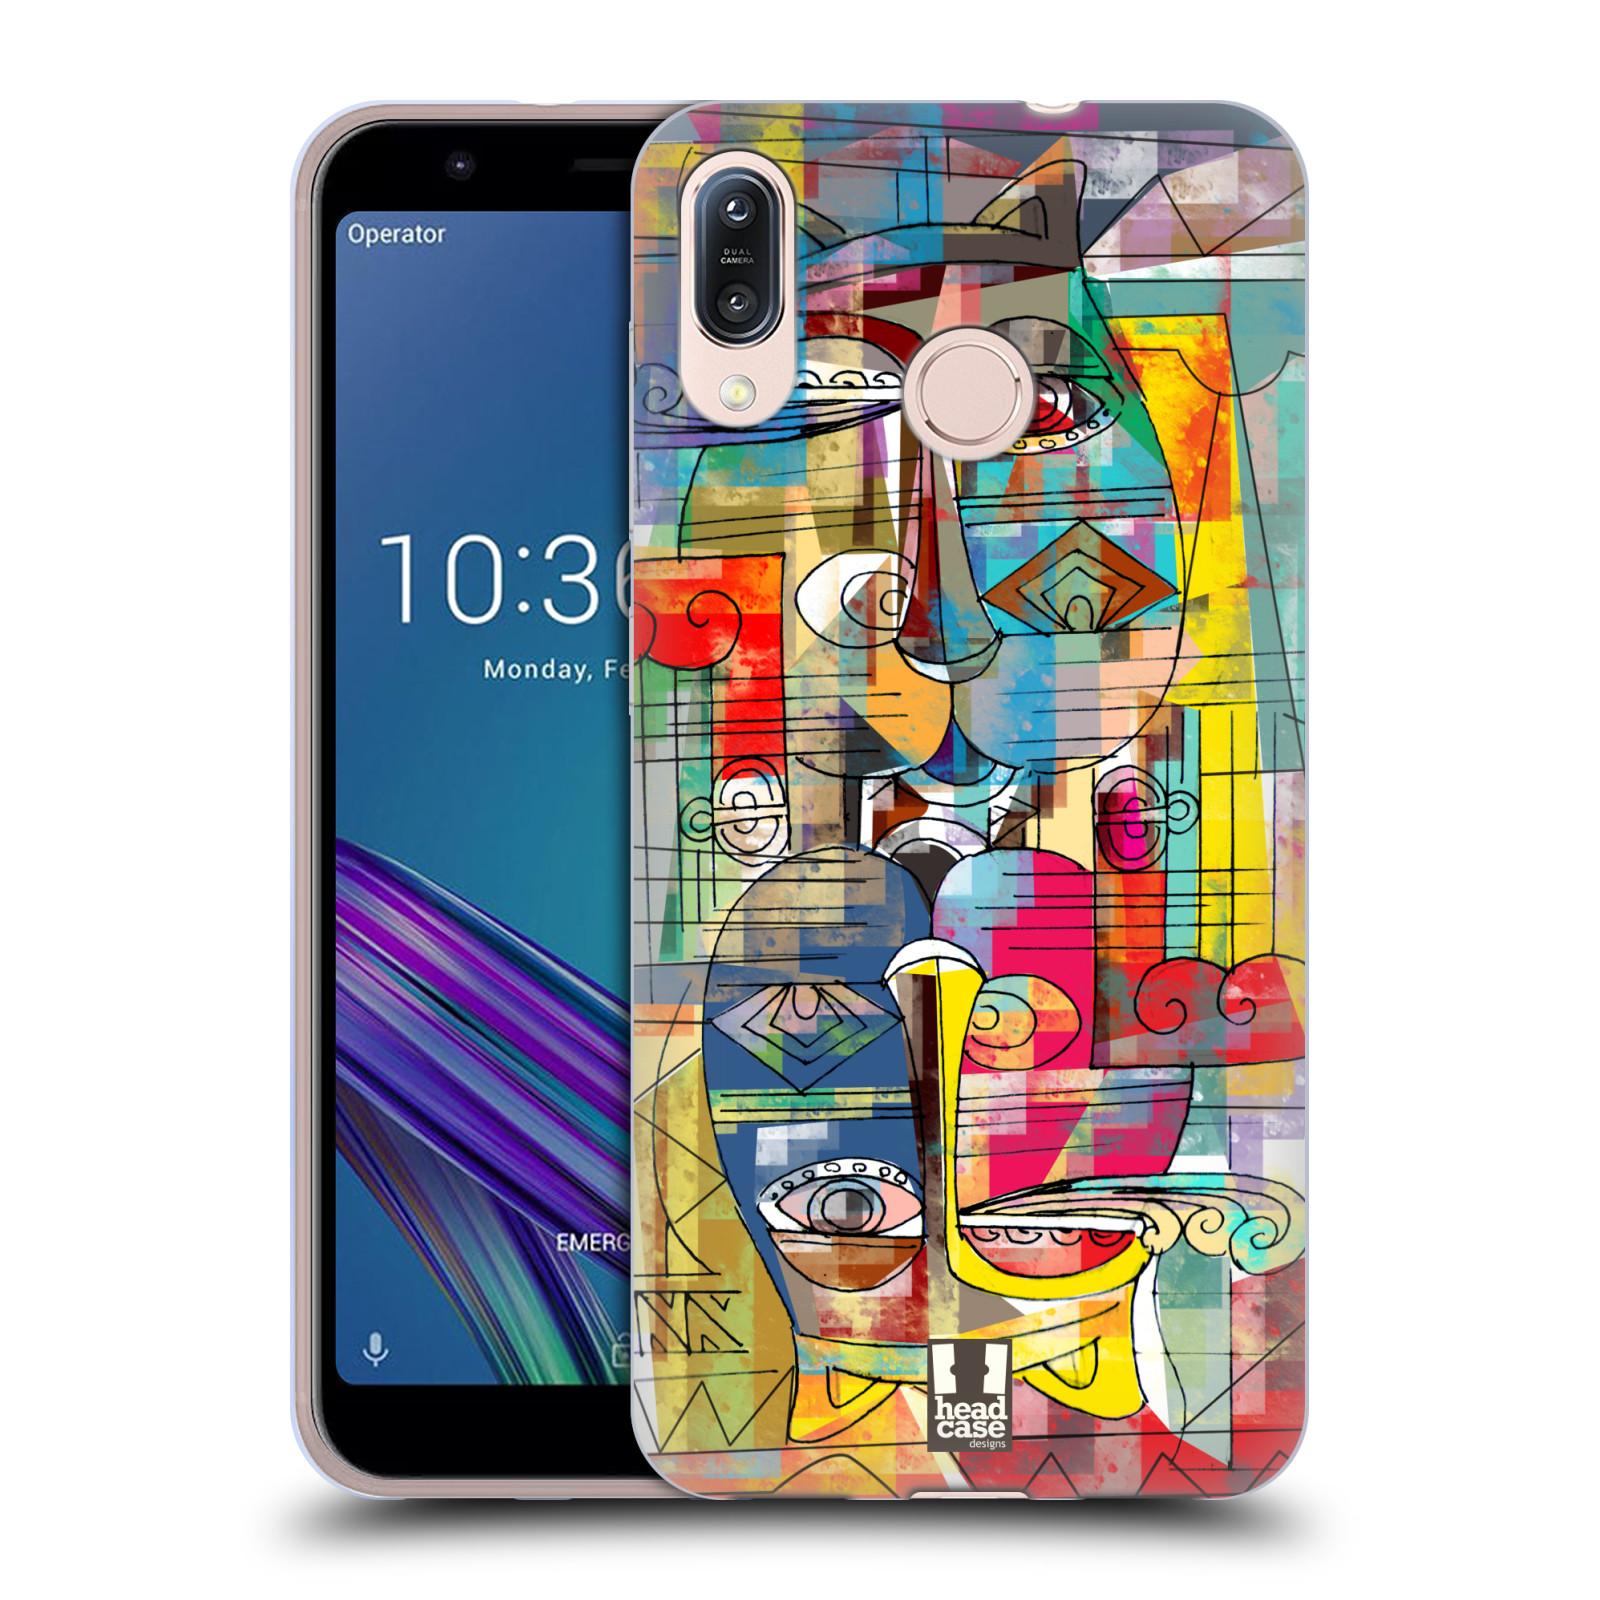 Silikonové pouzdro na mobil Asus Zenfone Max M1 ZB555KL - Head Case - AZTEC MANX